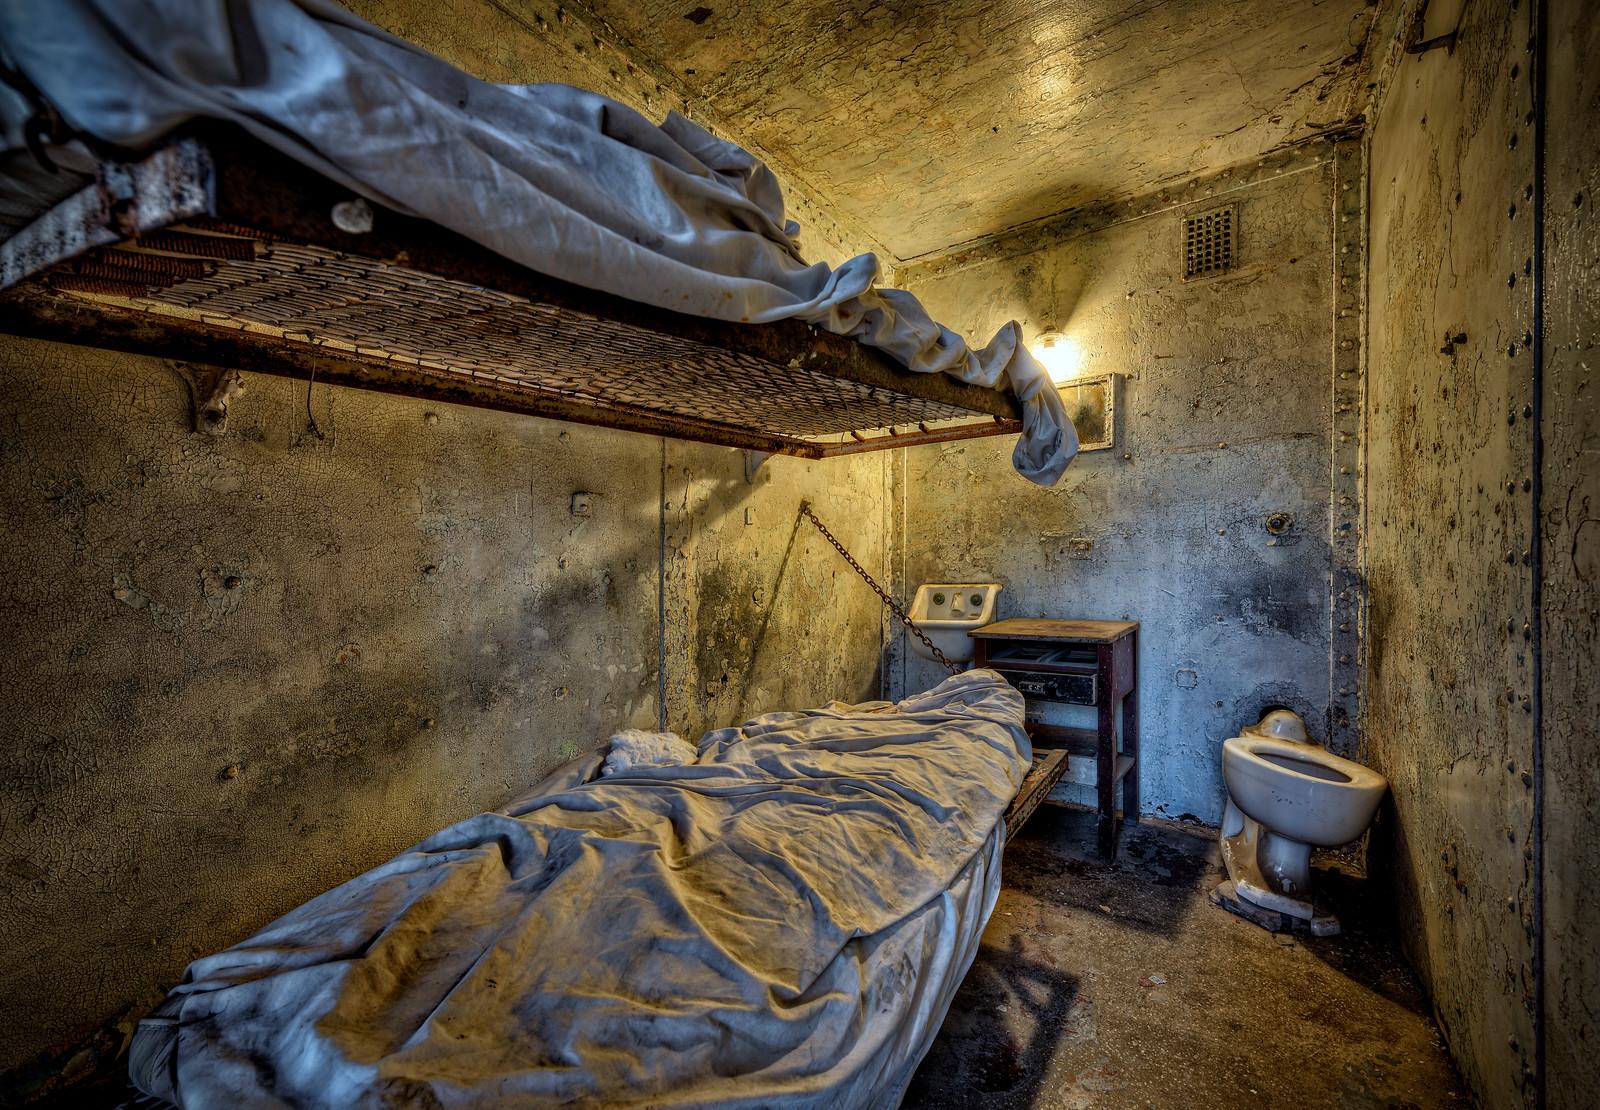 Ohio State Reformatory bunks